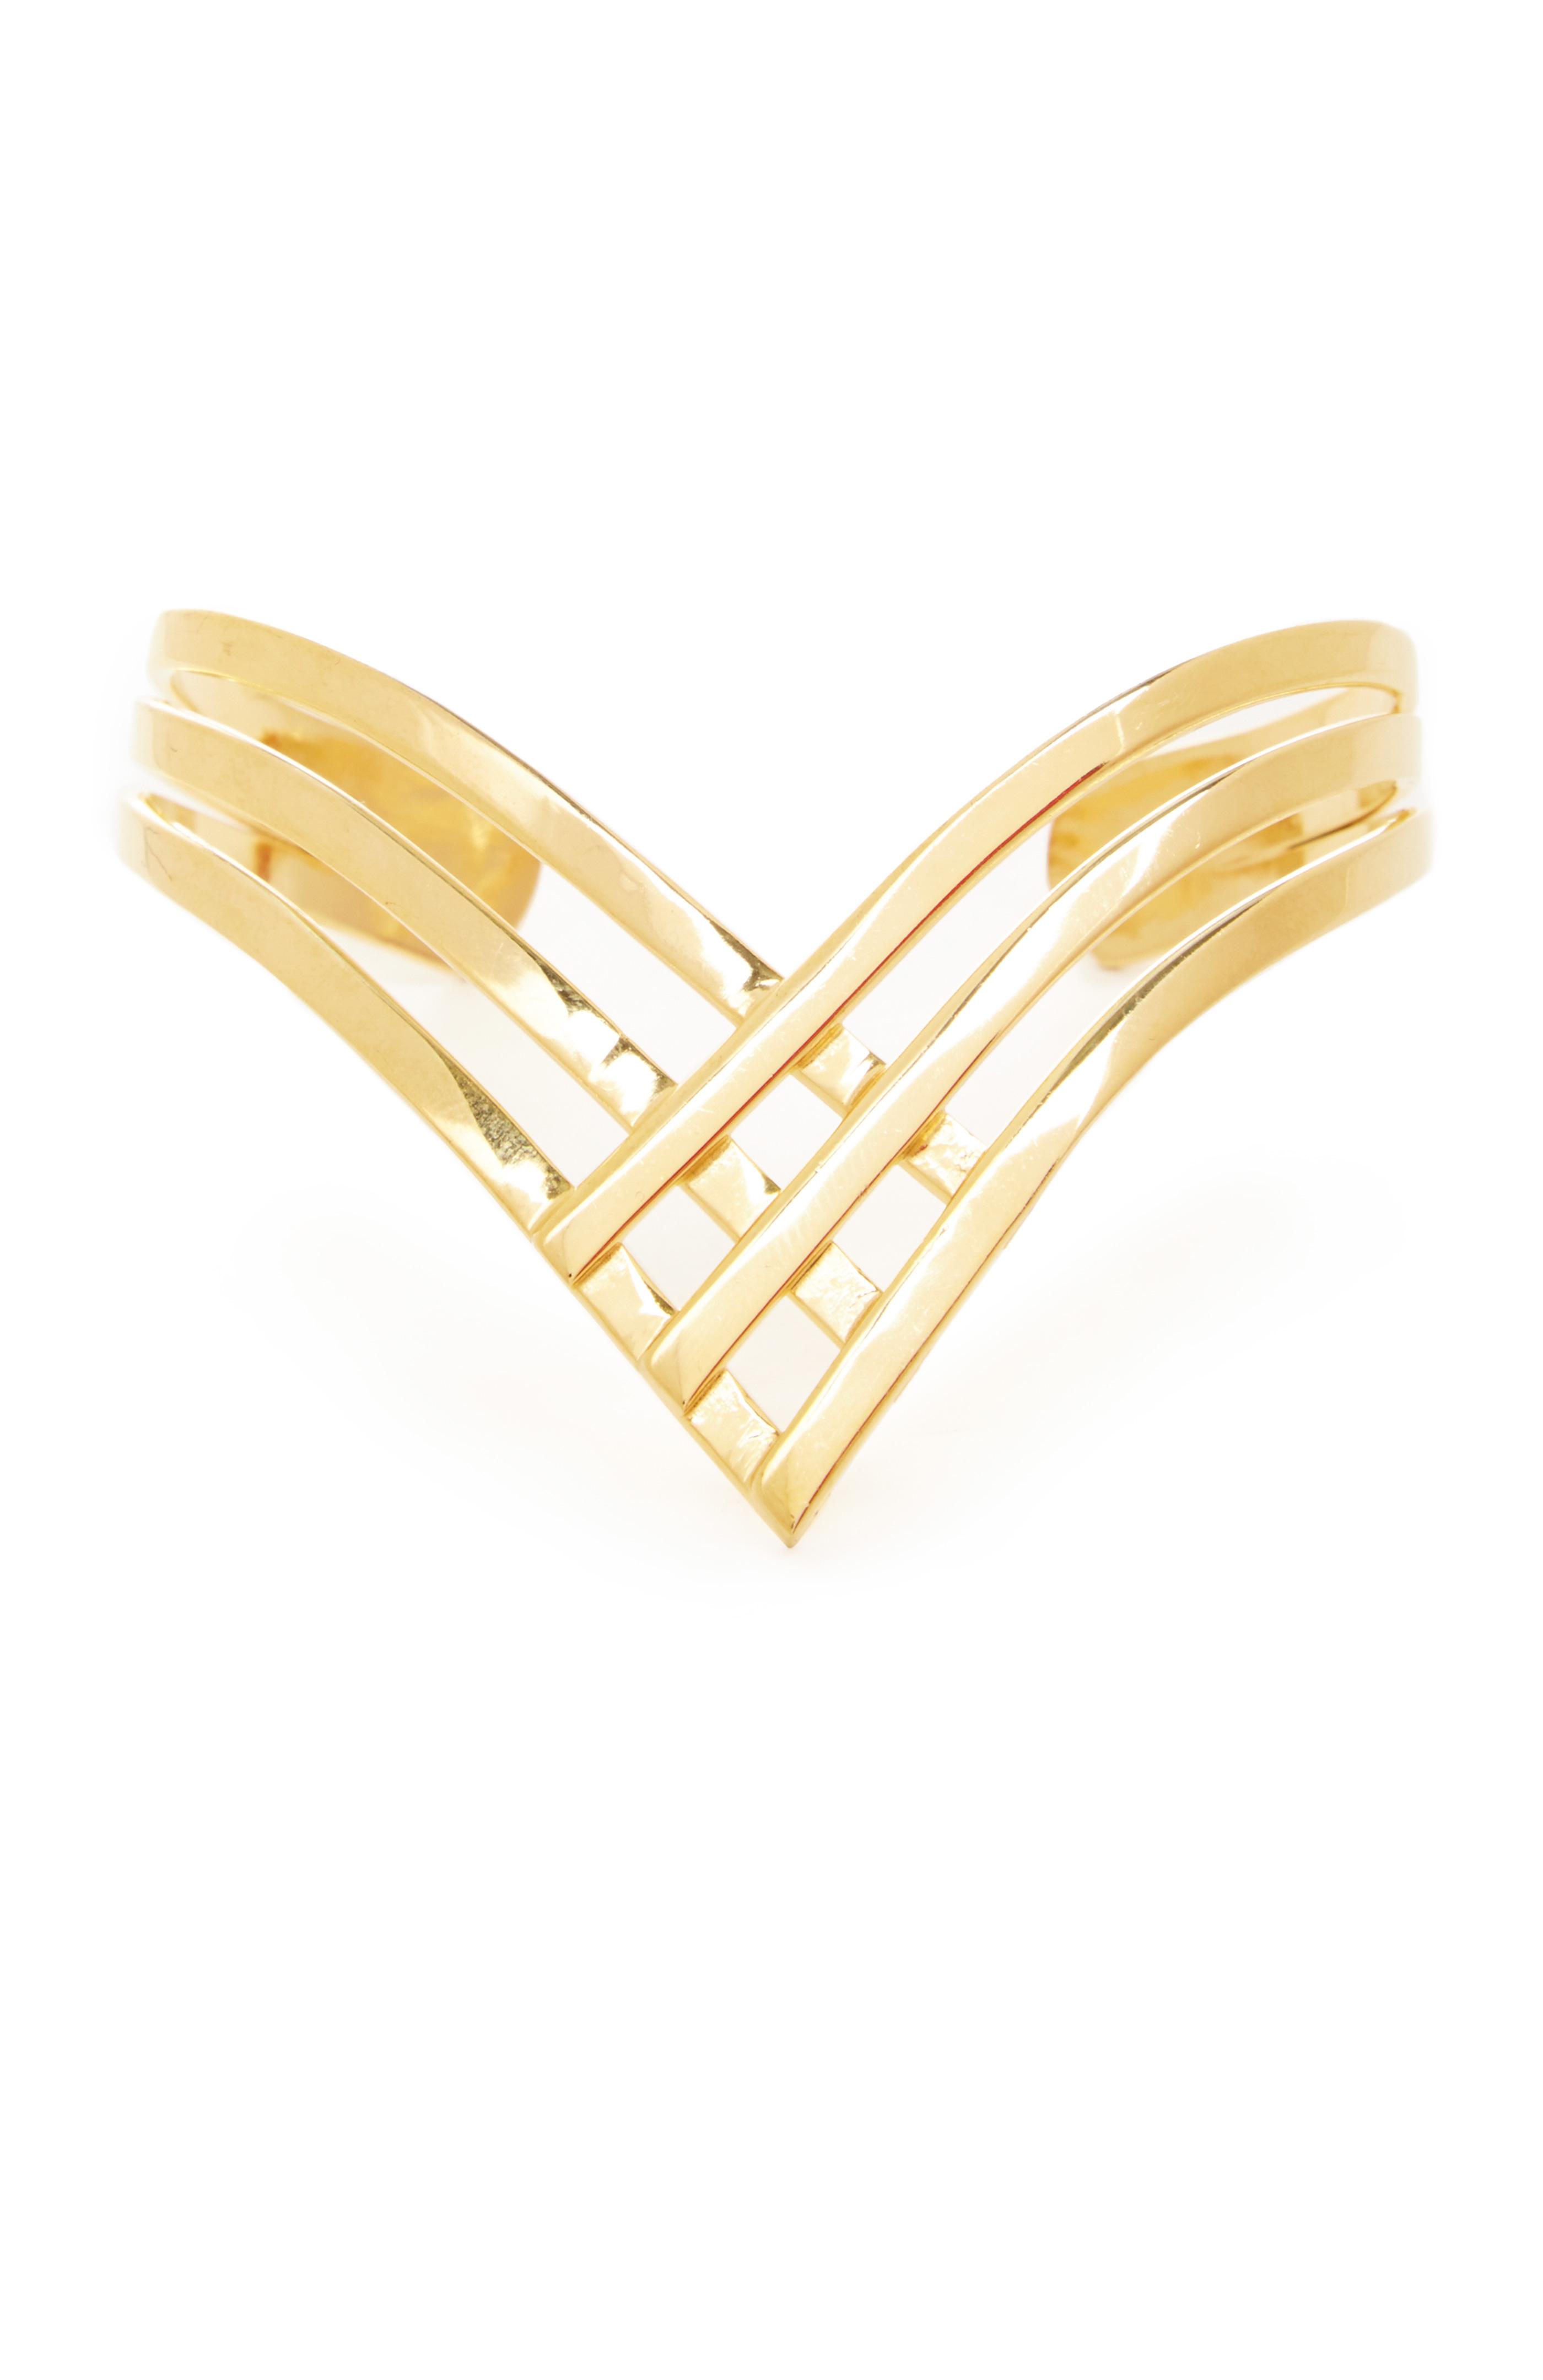 Natalie B Lightning Wrist Huggy Bracelet in gold at DAILYLOOK